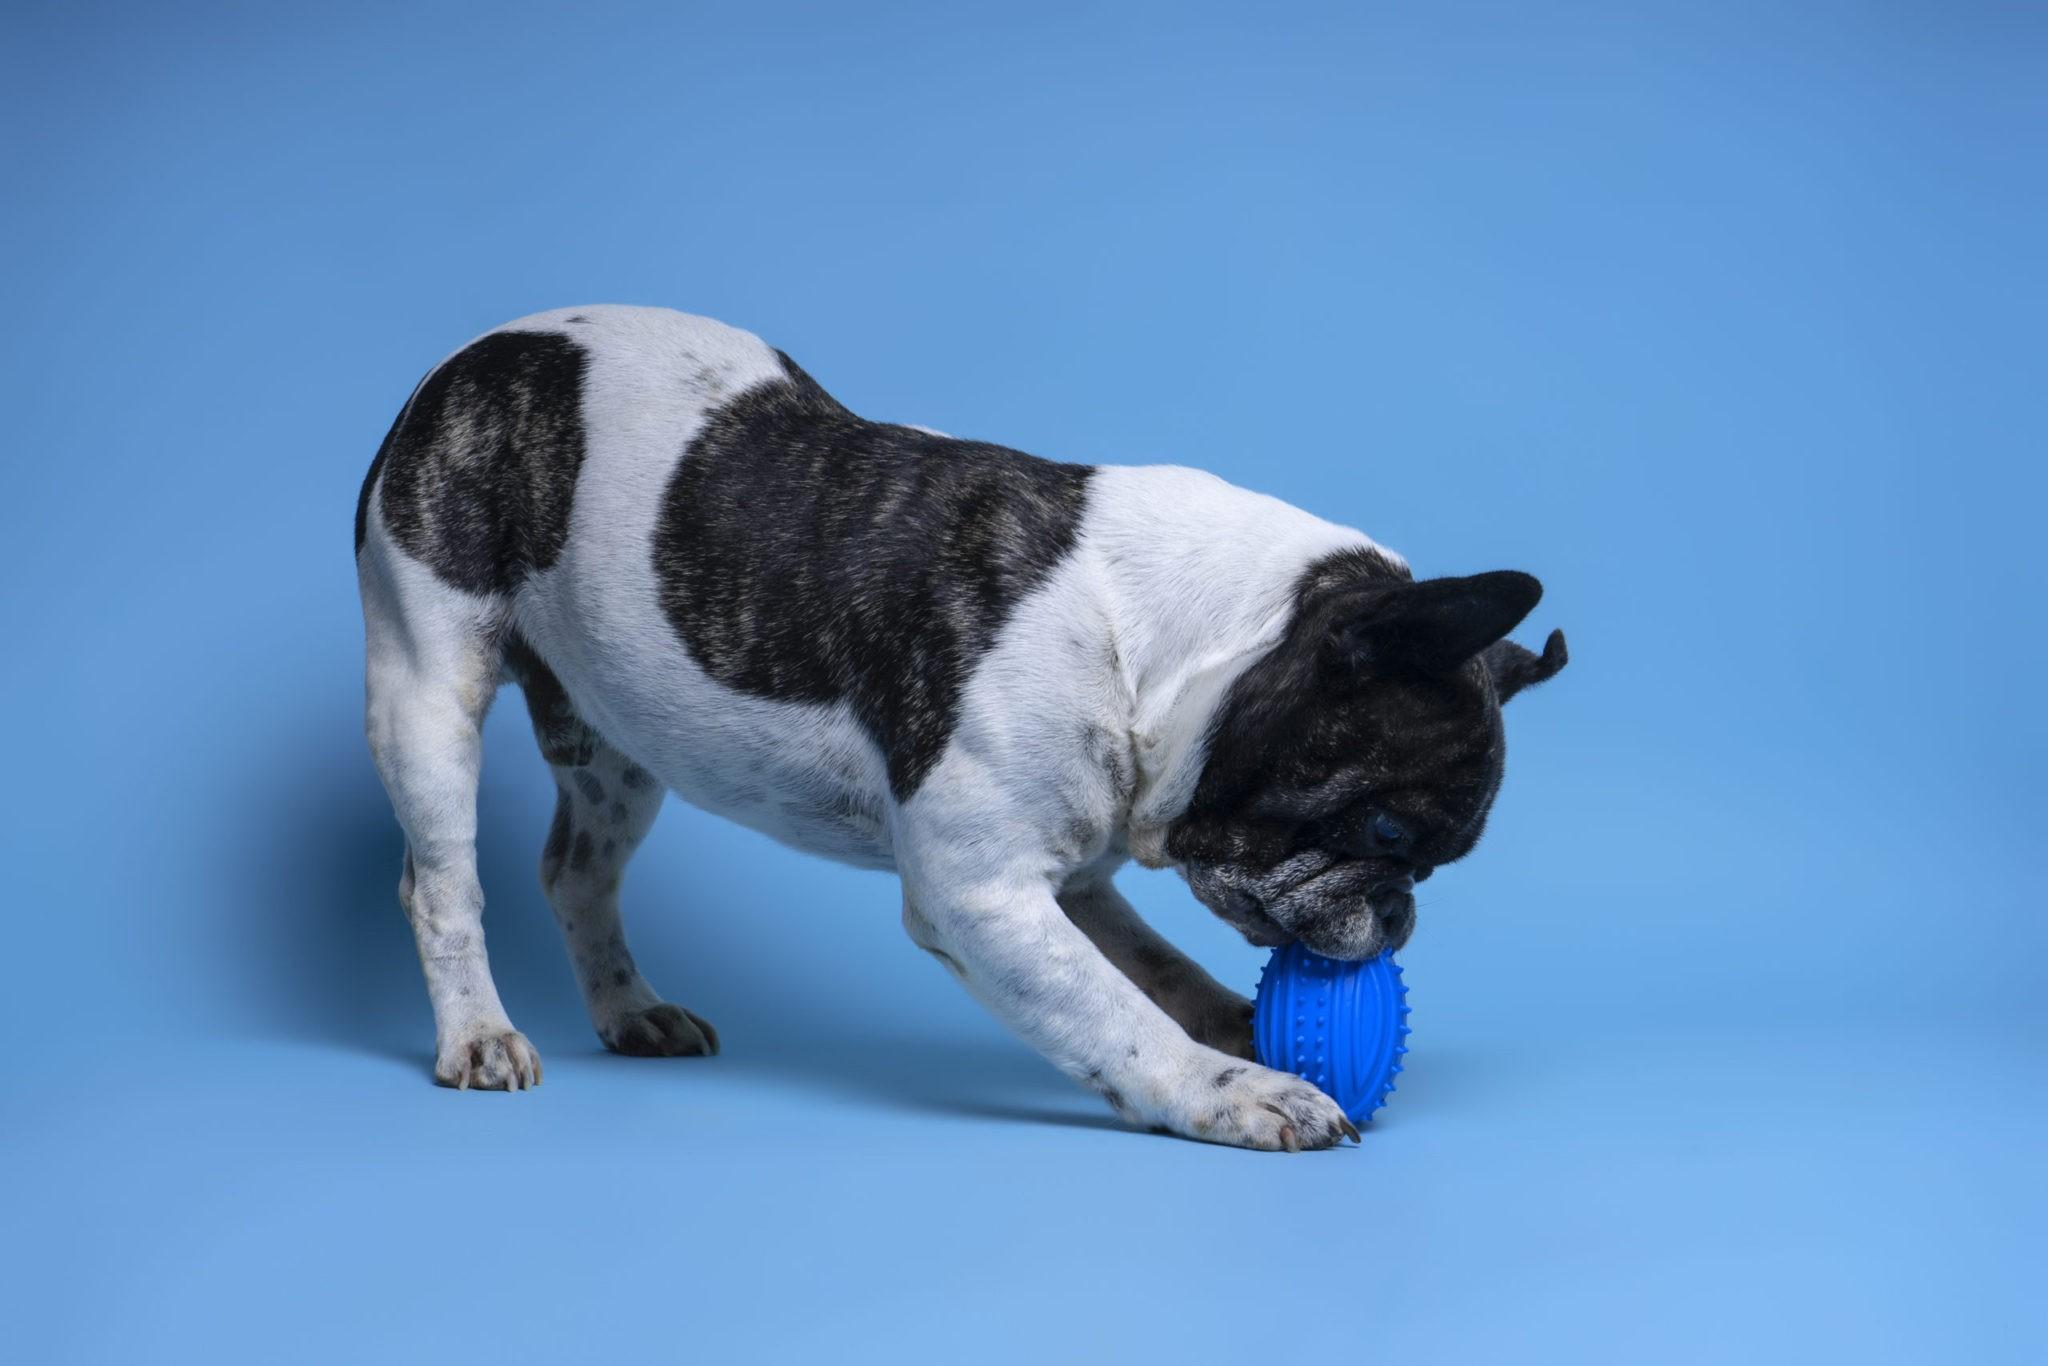 Top 10 Best Tough & Indestructible Squeaky Dog Toys | Funadog